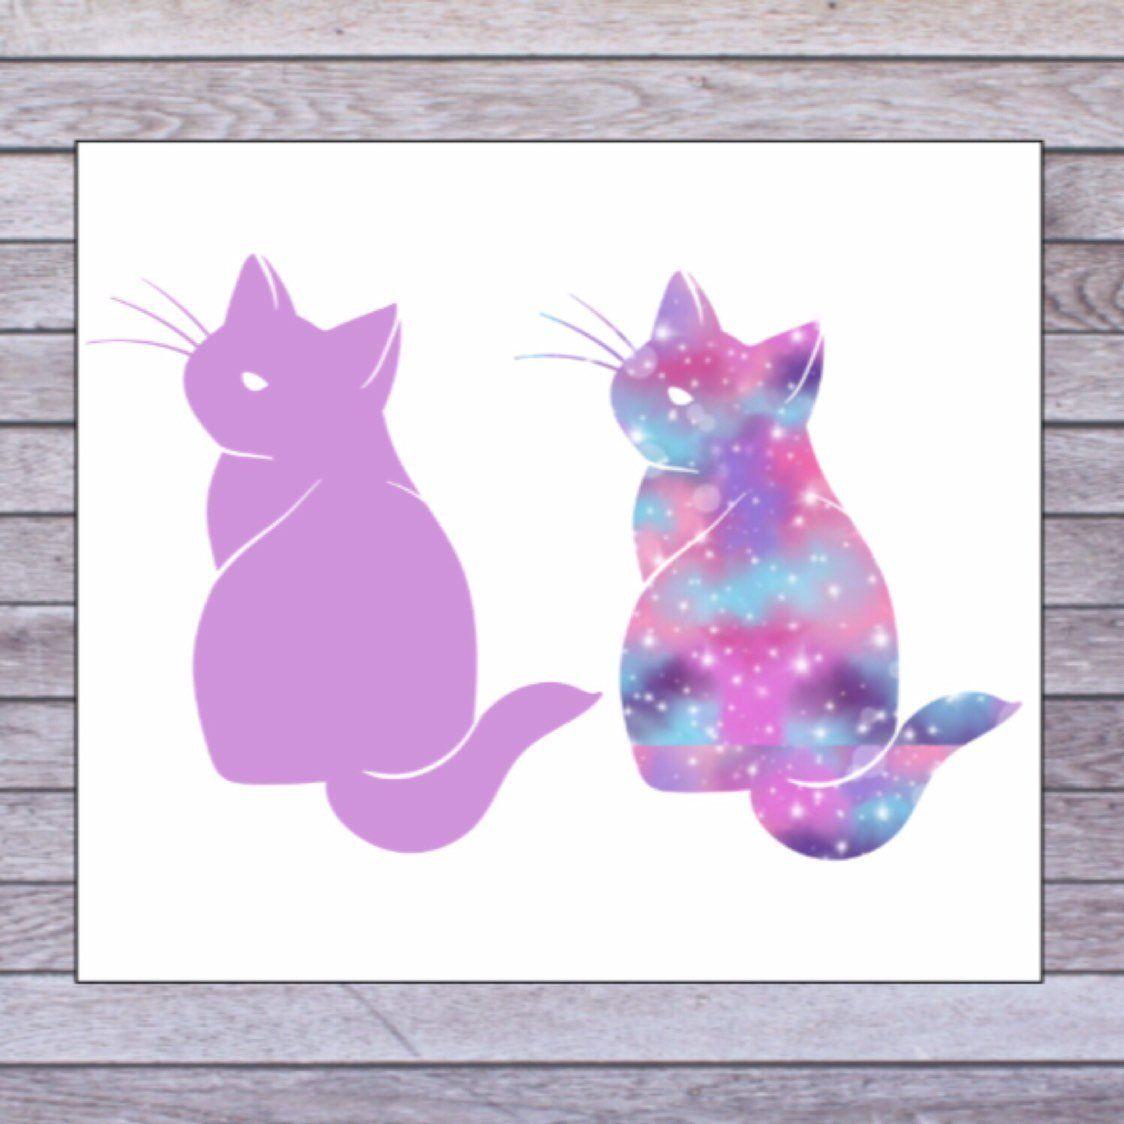 Cat Laptop Decal Cat Sticker Cat Mom Decal Cat Cup Decal Etsy Cat Decal Cat Stickers Vinyl Decals